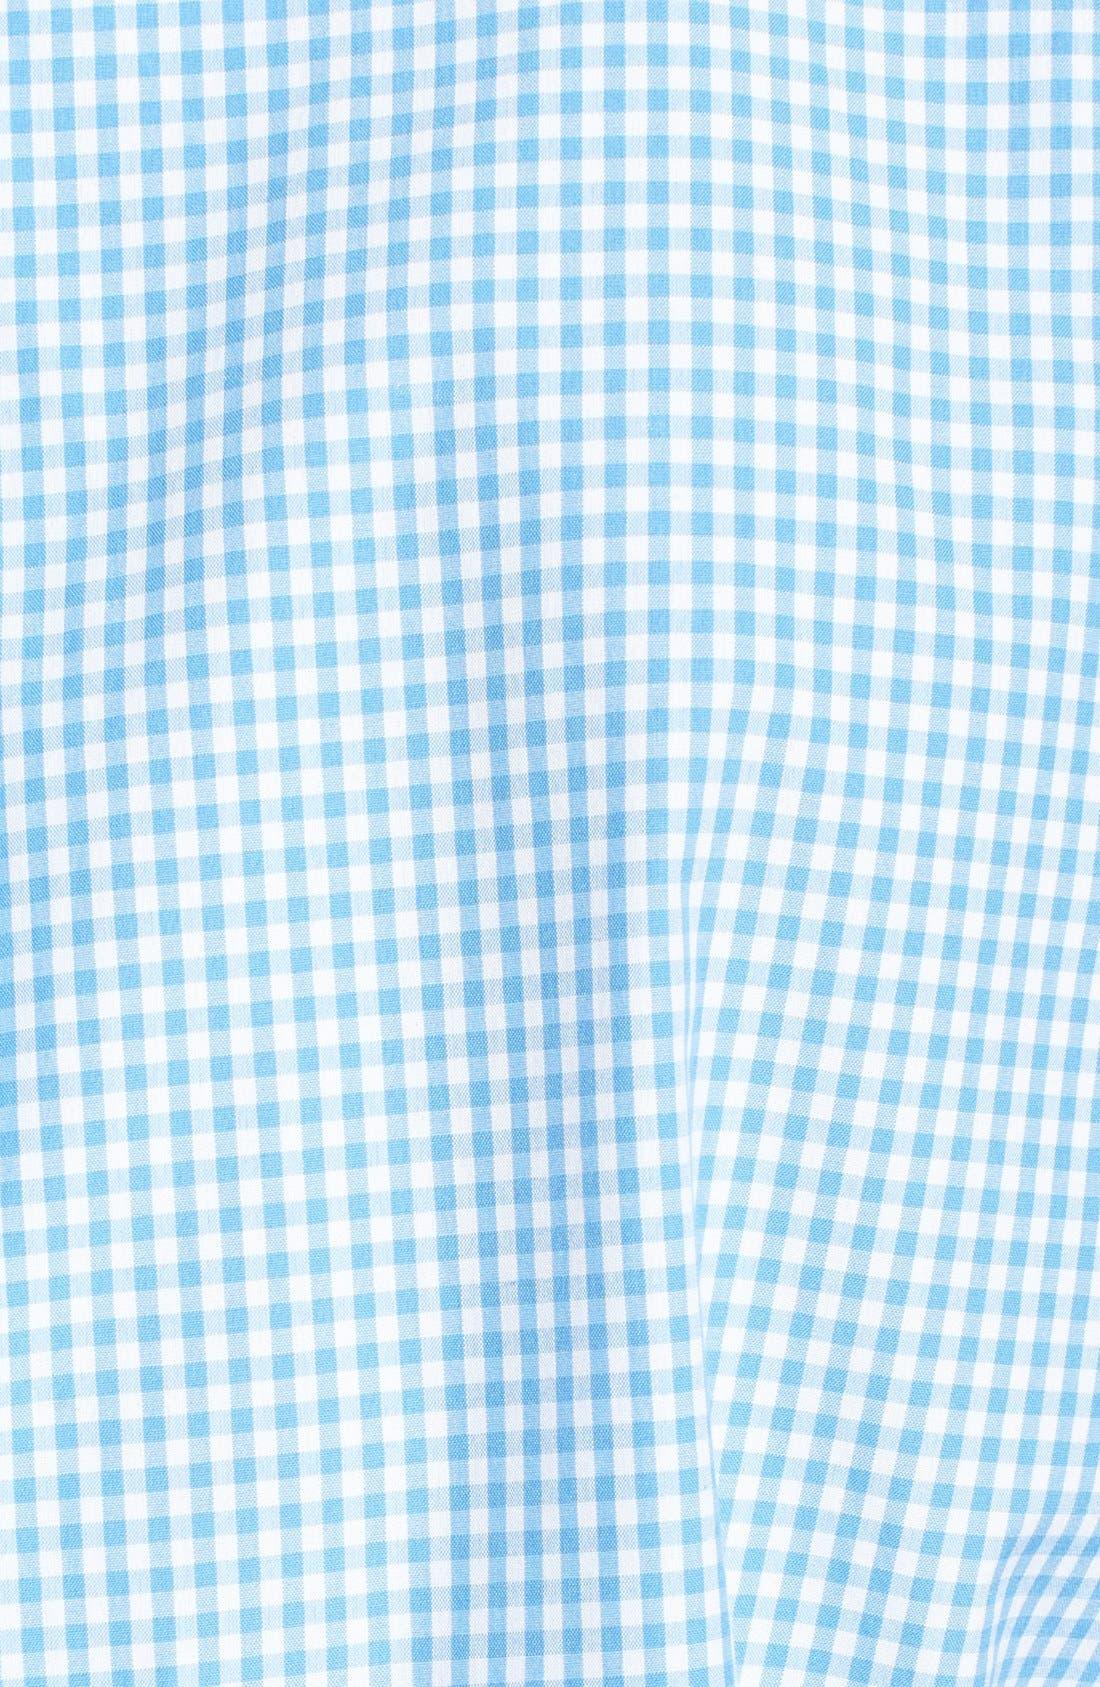 Alternate Image 3  - Vineyard Vines 'Whale' Classic Fit Check Poplin Sport Shirt